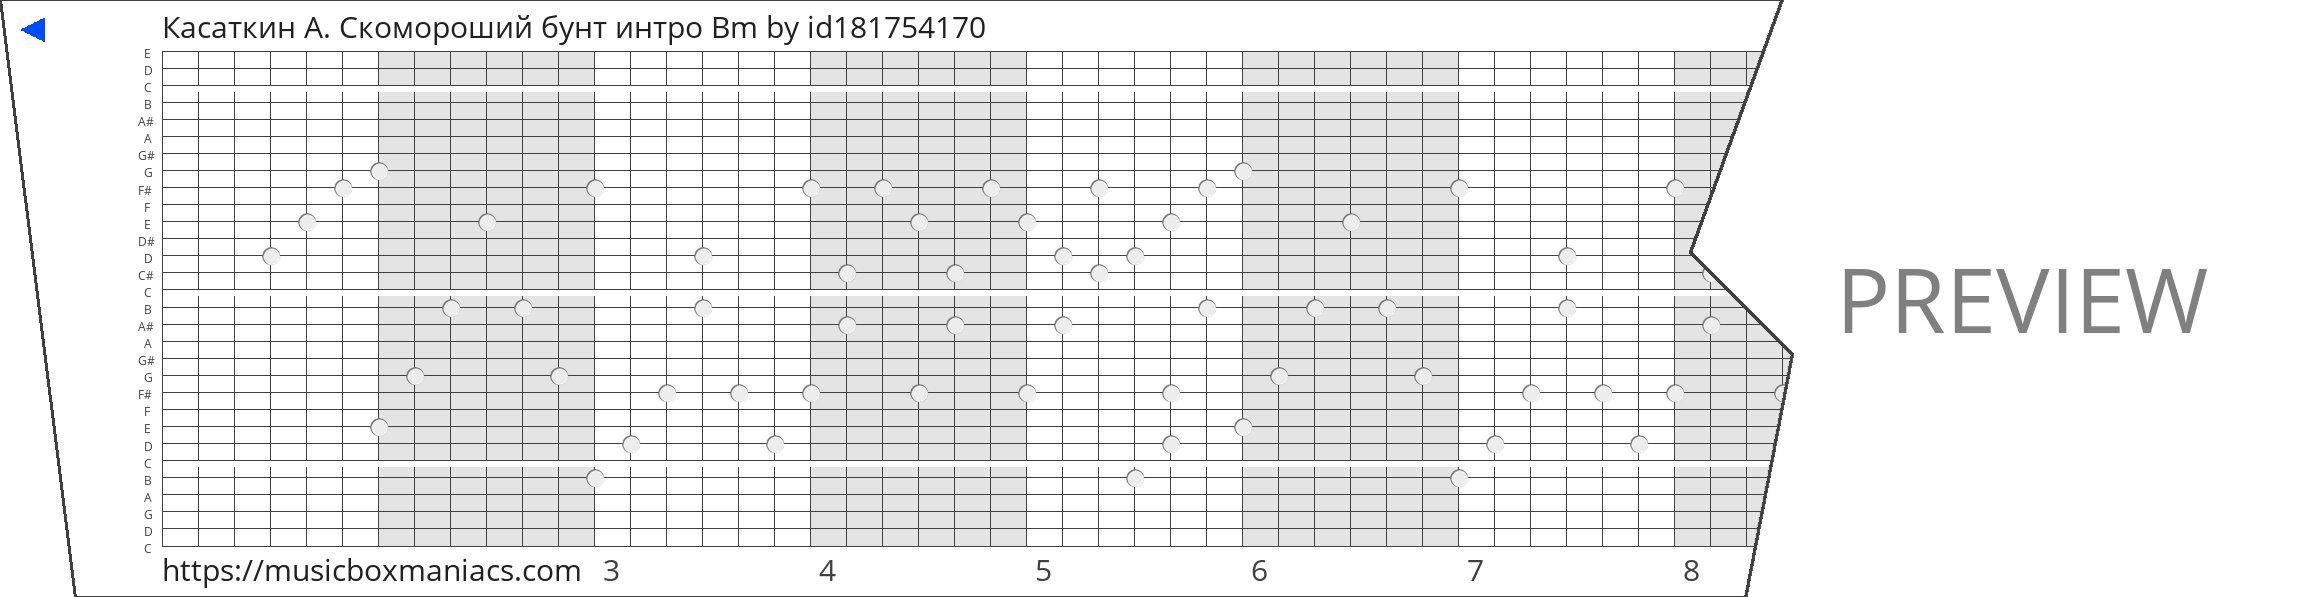 Касаткин А. Скомороший бунт интро Bm 30 note music box paper strip